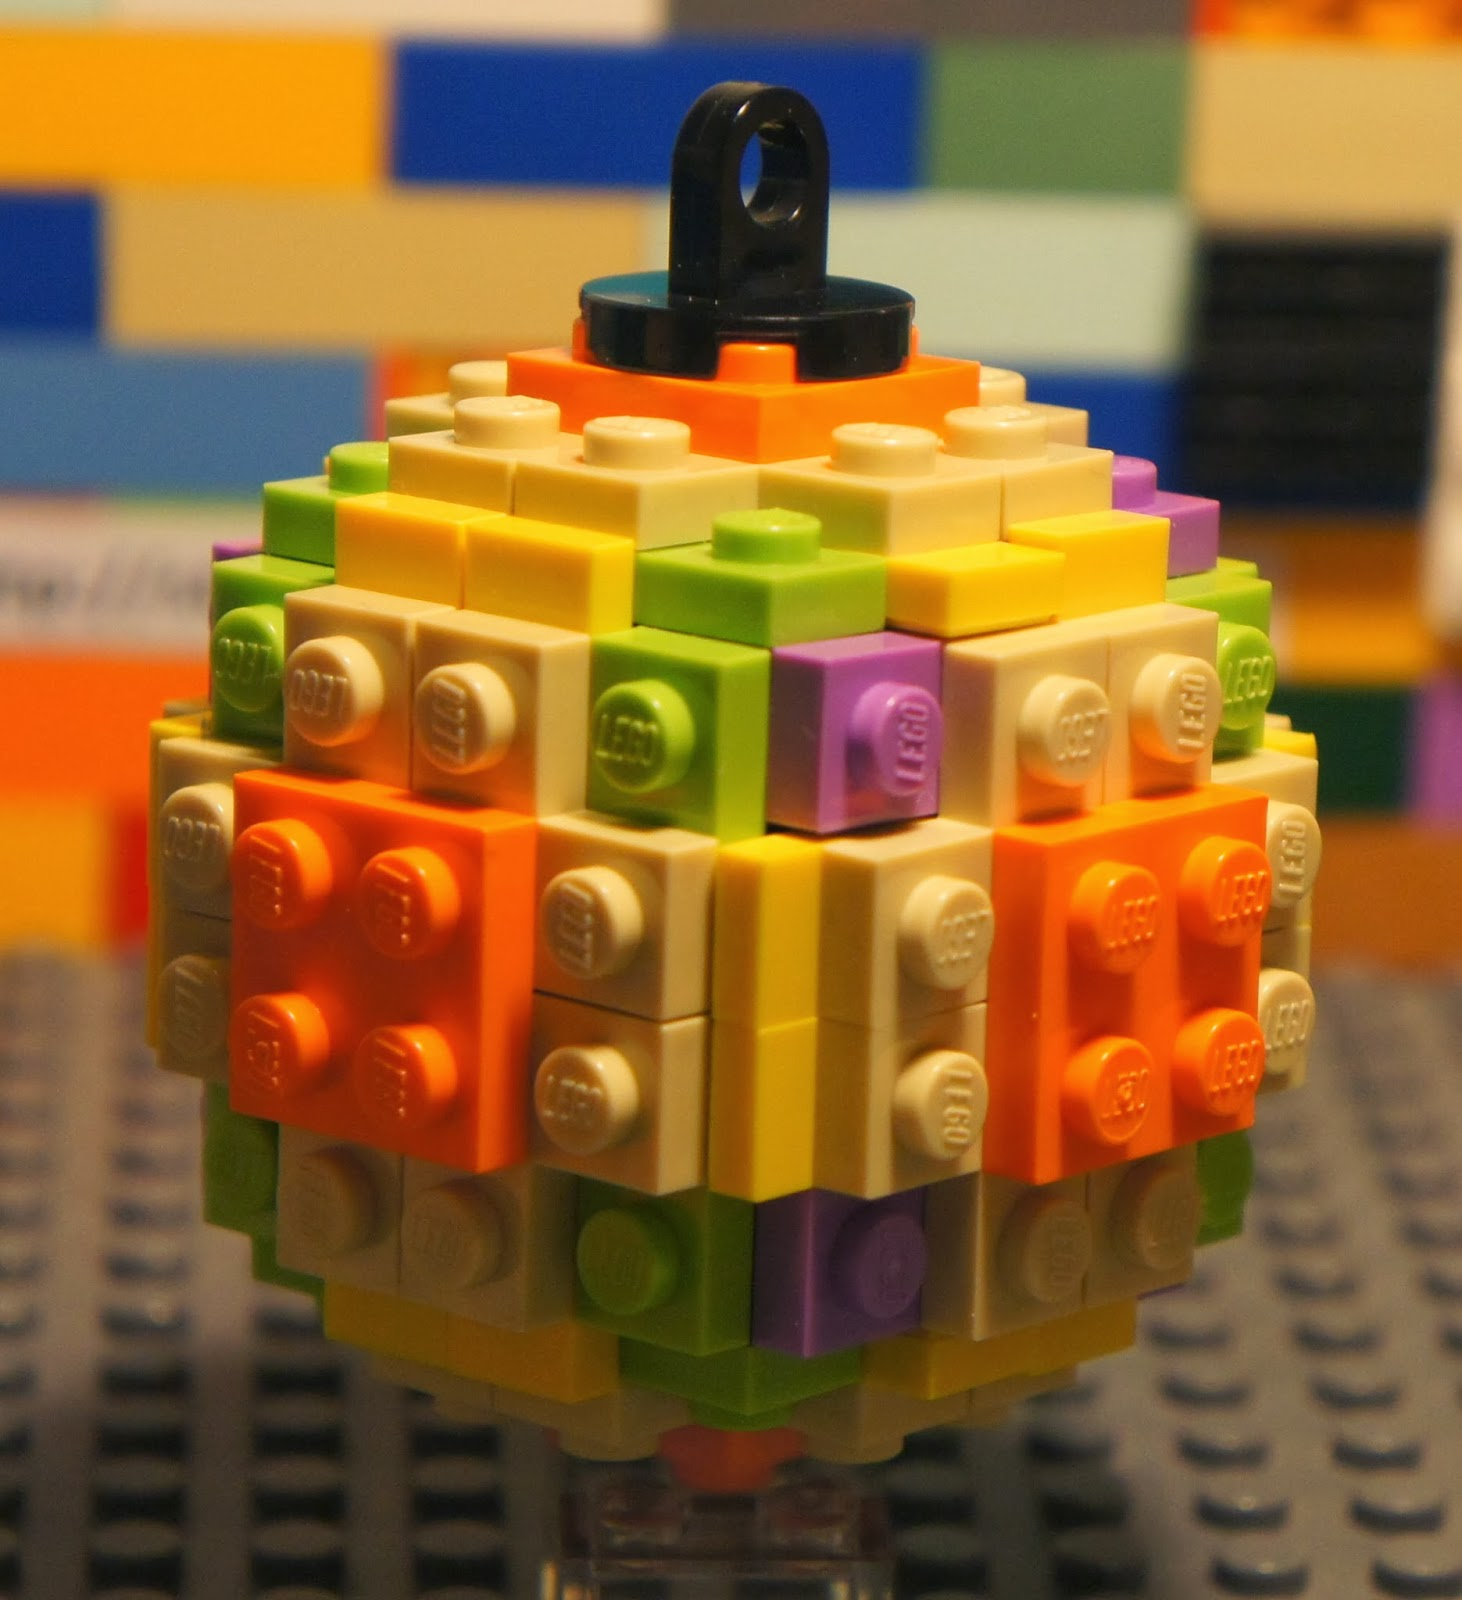 Lego Christmas Balls Holiday Tree Ornament Decor Hard To